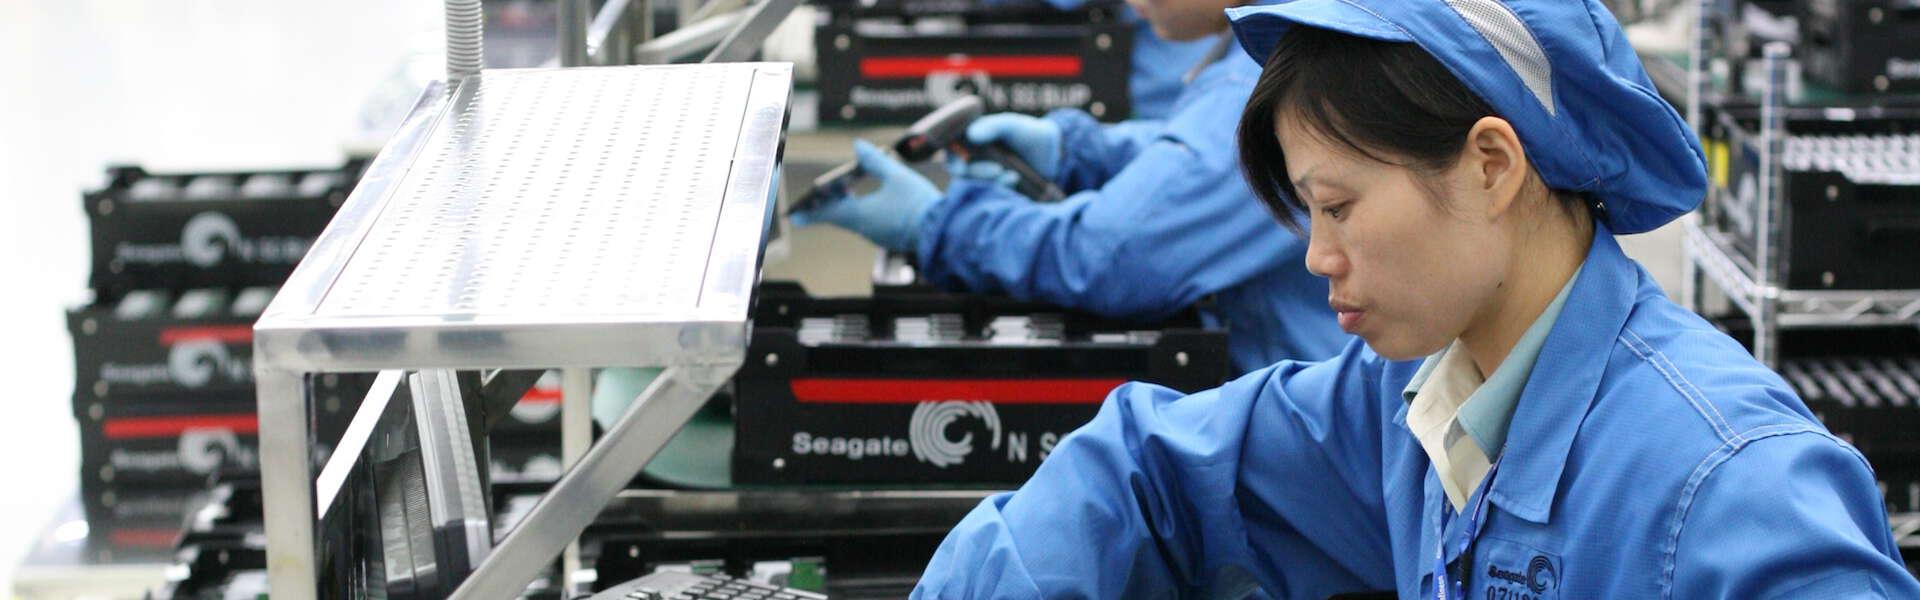 NexThought Monday: Closing China's Credit Gap, on NextBillion.net